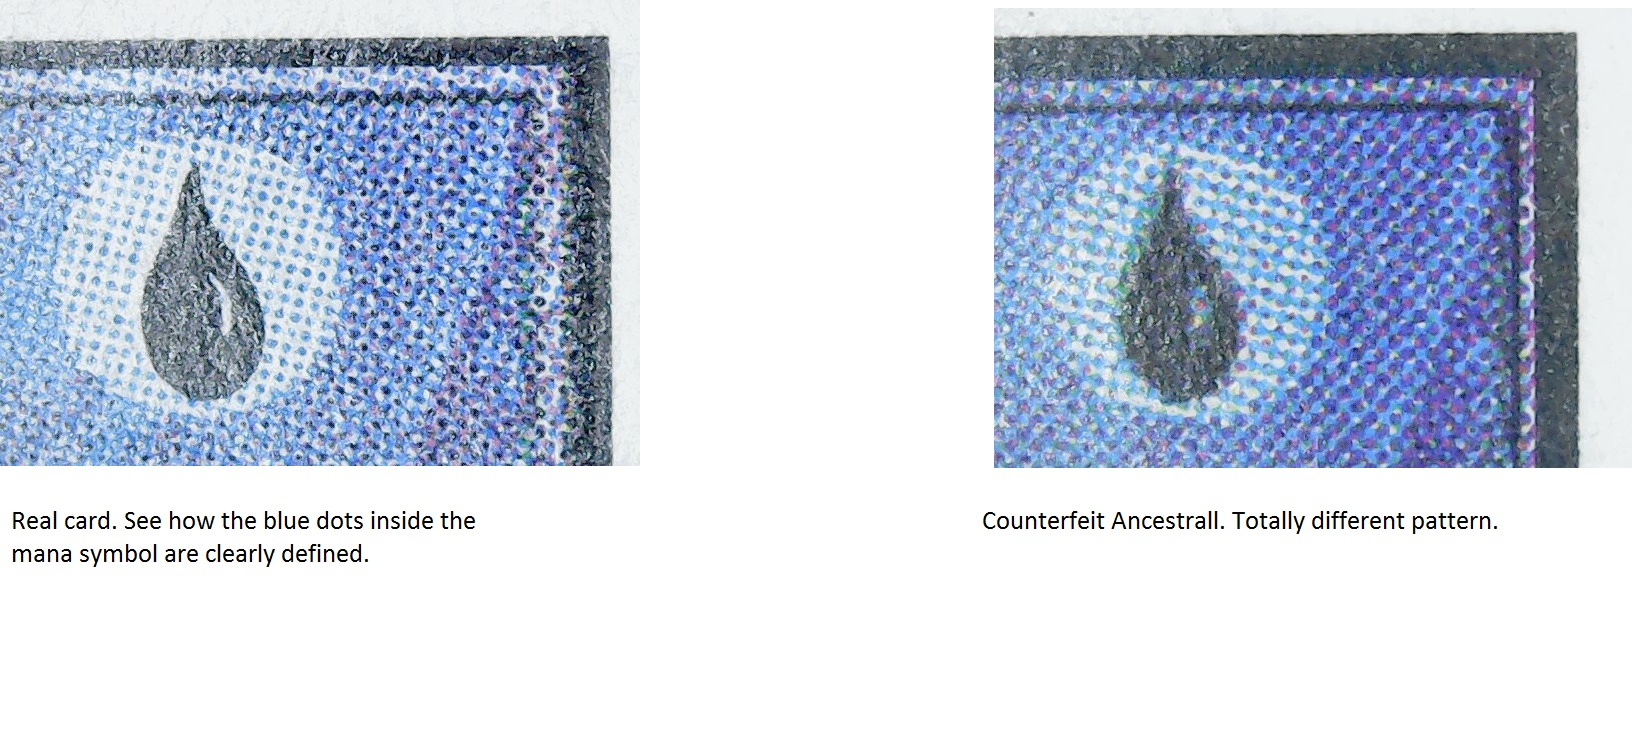 Counterfeit Ancestrall Recall mana symbol